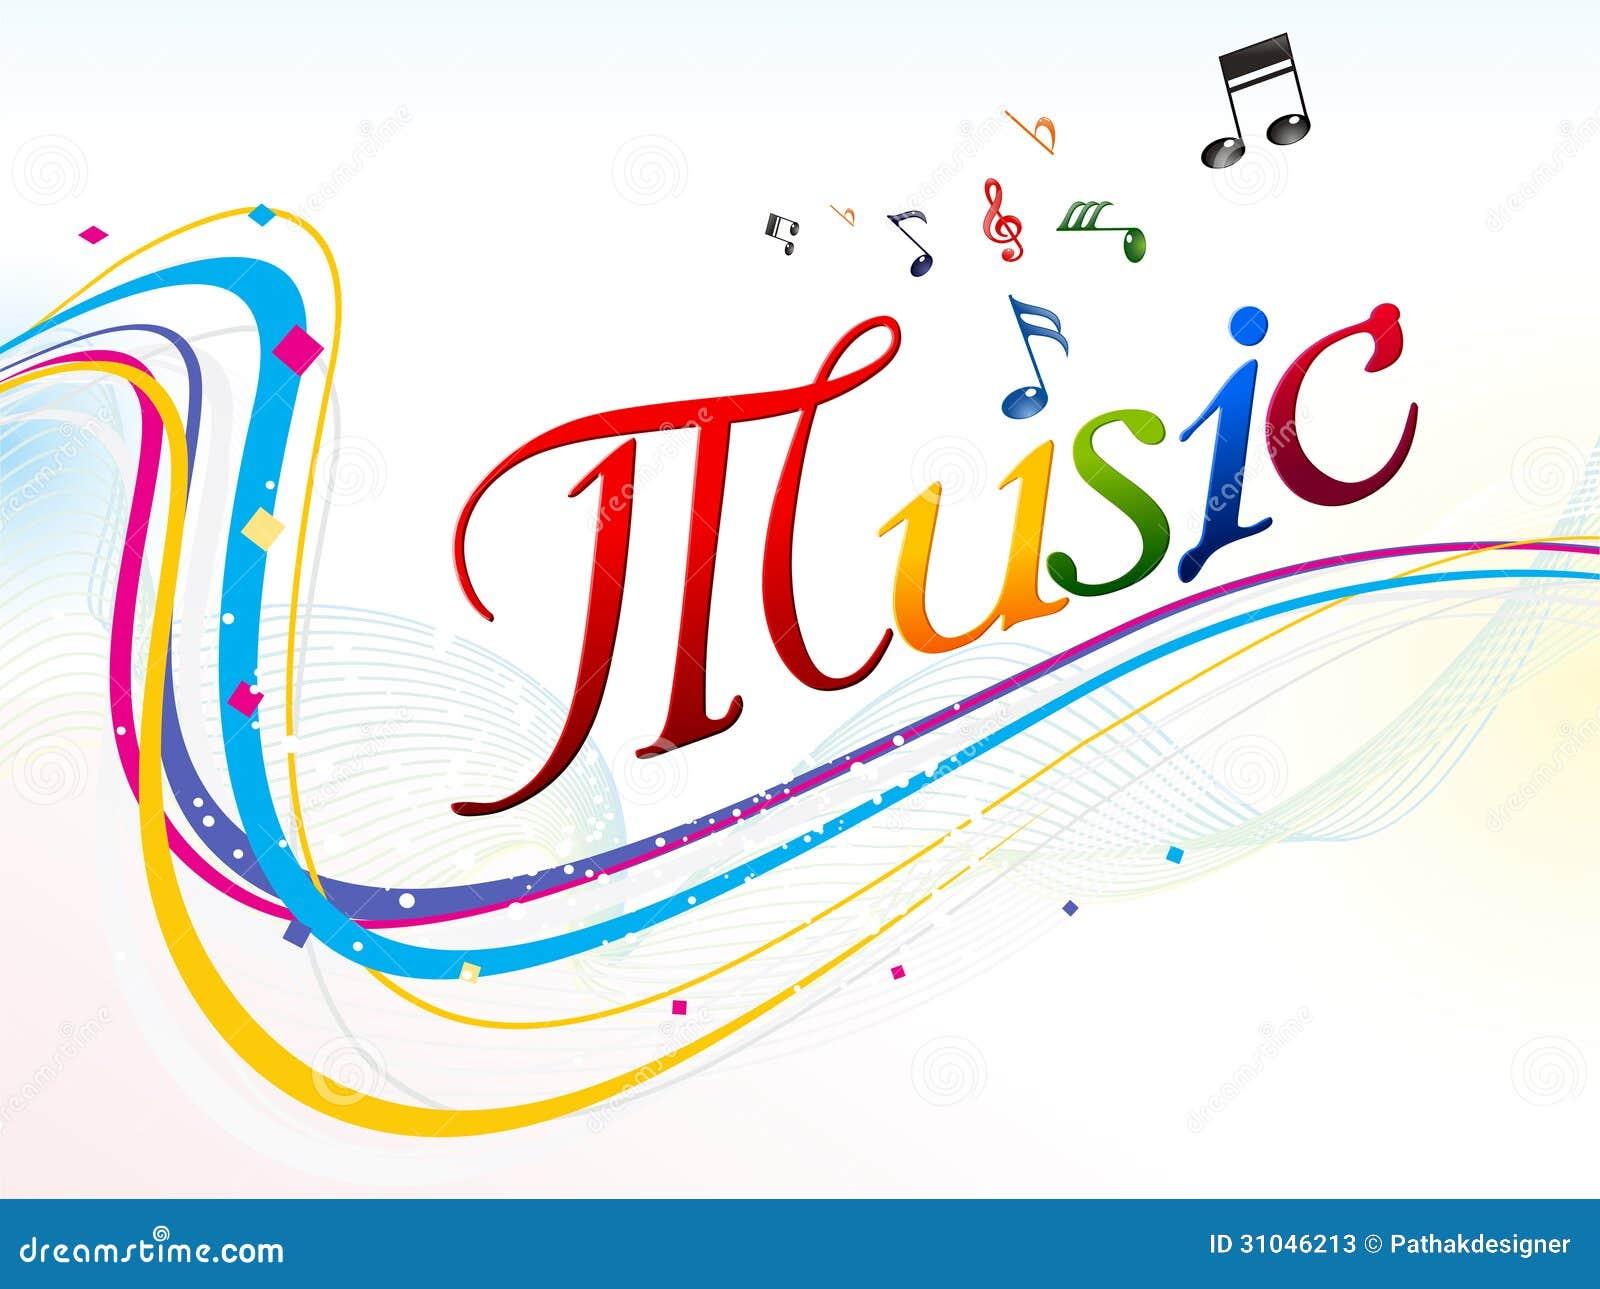 musictext music text pendulum - photo #27